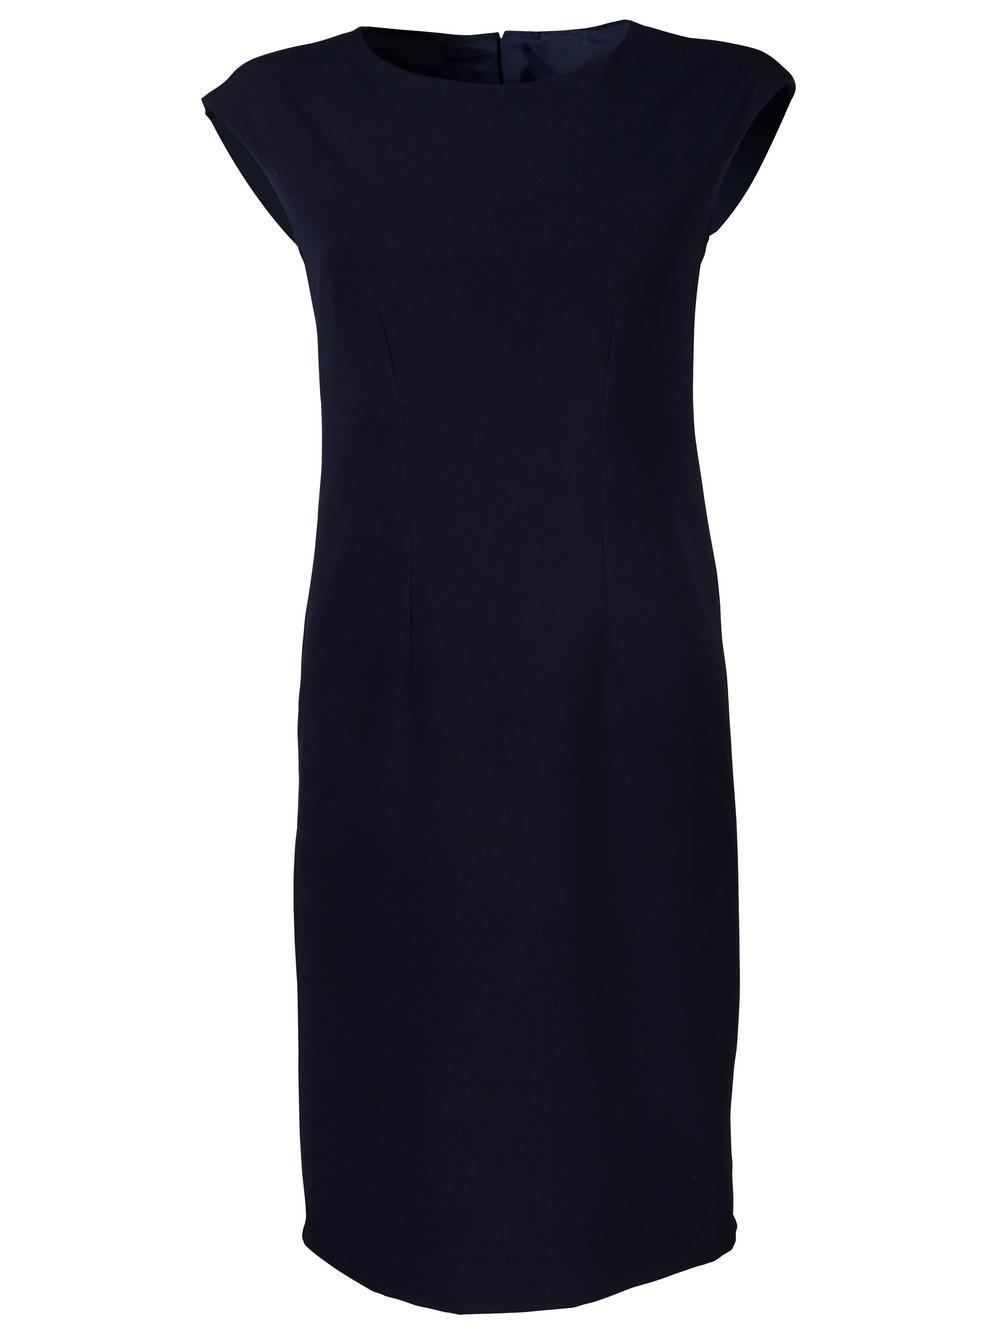 Kendal 599 S/less Dress - Navy